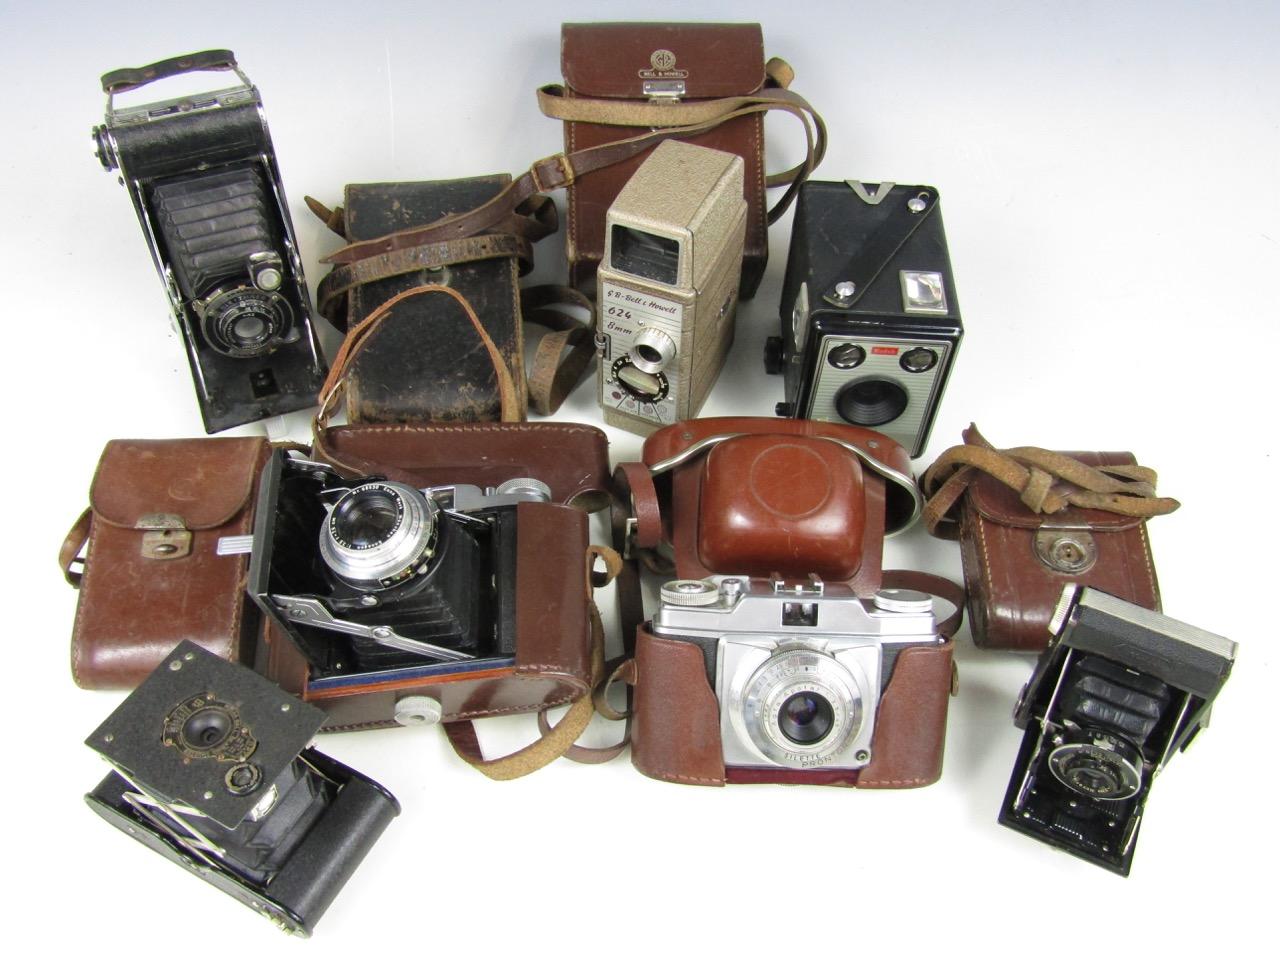 Lot 35 - A quantity of vintage cameras including a Kodak vest pocket, a Zeiss Ikonta 20 /18 folding camera, a